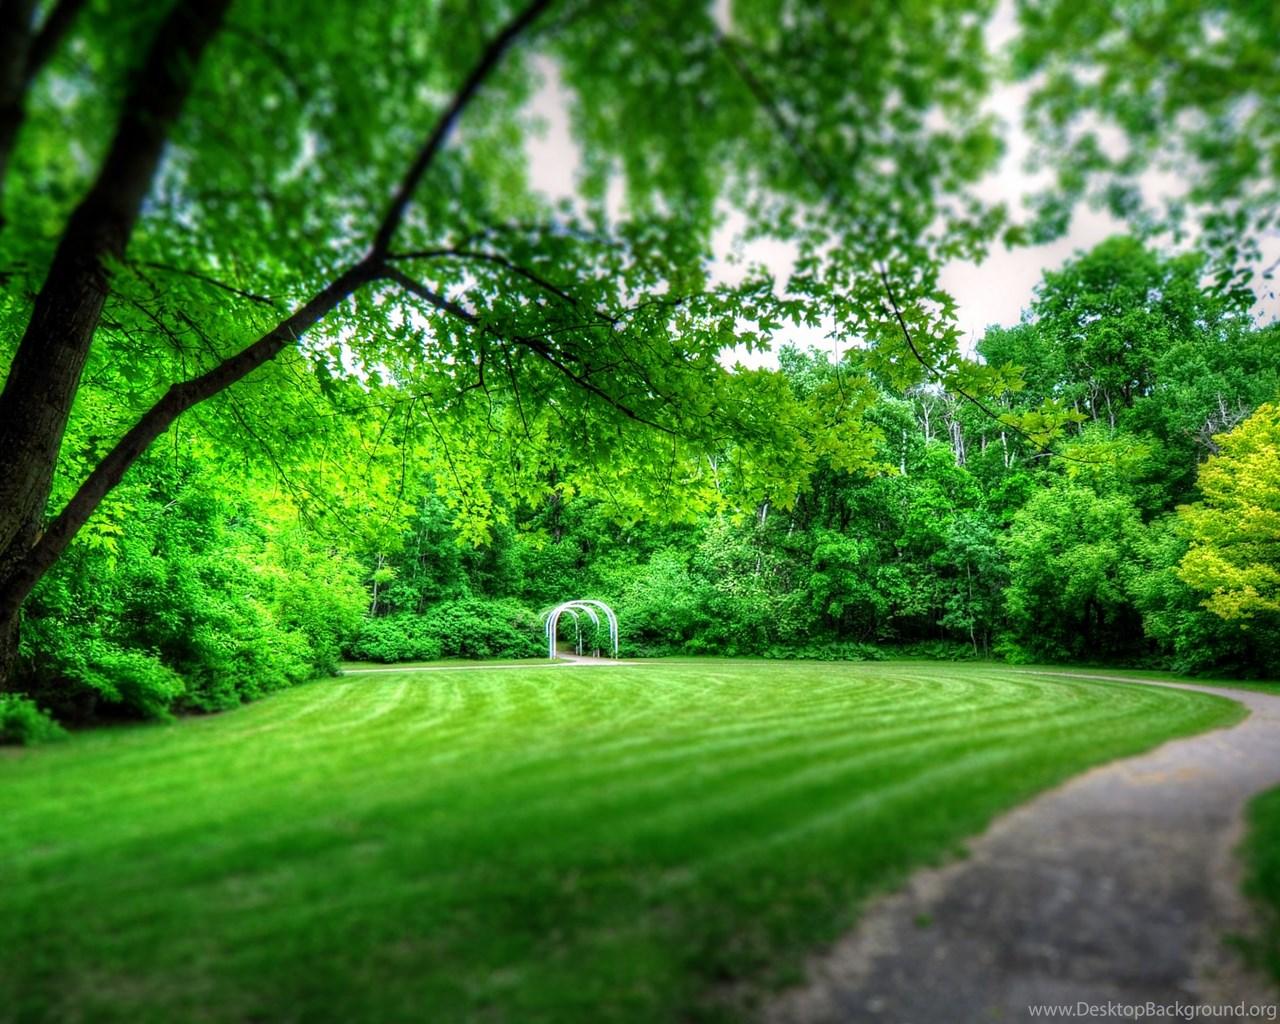 Park Landscape Wallpapers Full HD 3840x2160 Free